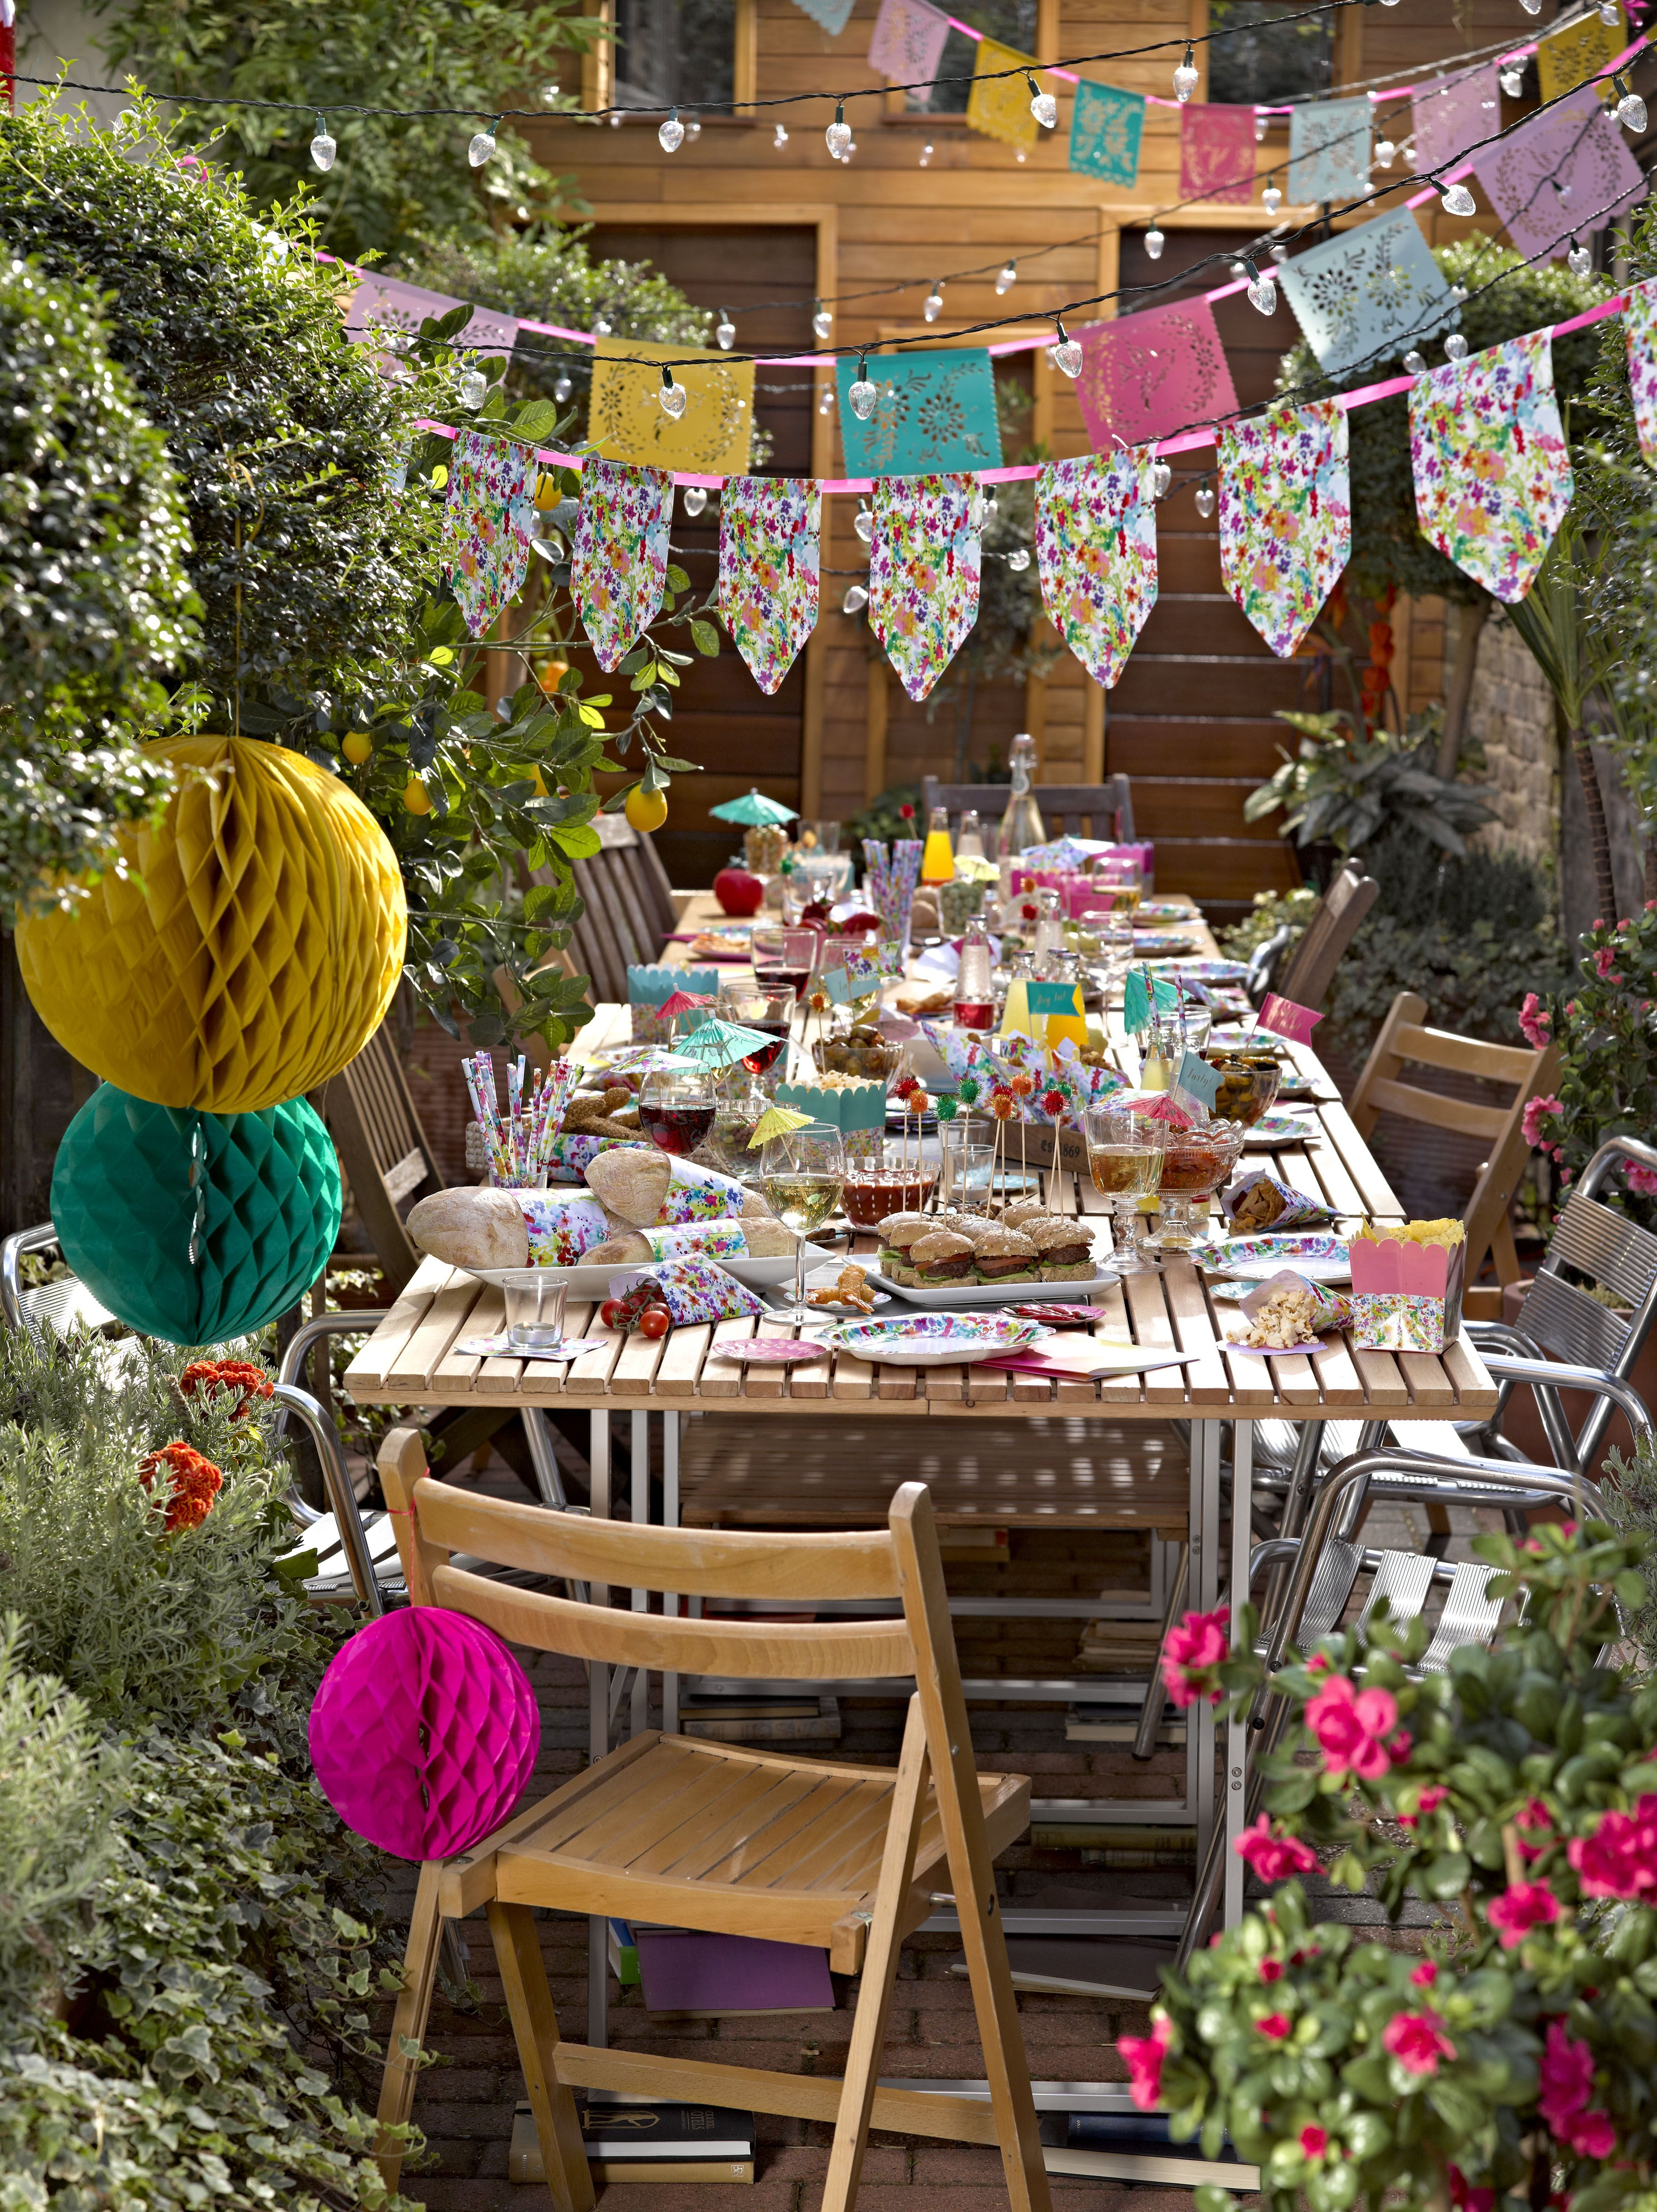 Floral Fiesta Party Http Www Partyboxes At Erwachsenen Party Themen Party Floral Fiesta Part Decoracoes Da Festa De Jardim Festa De Churrasco Festa 30anos